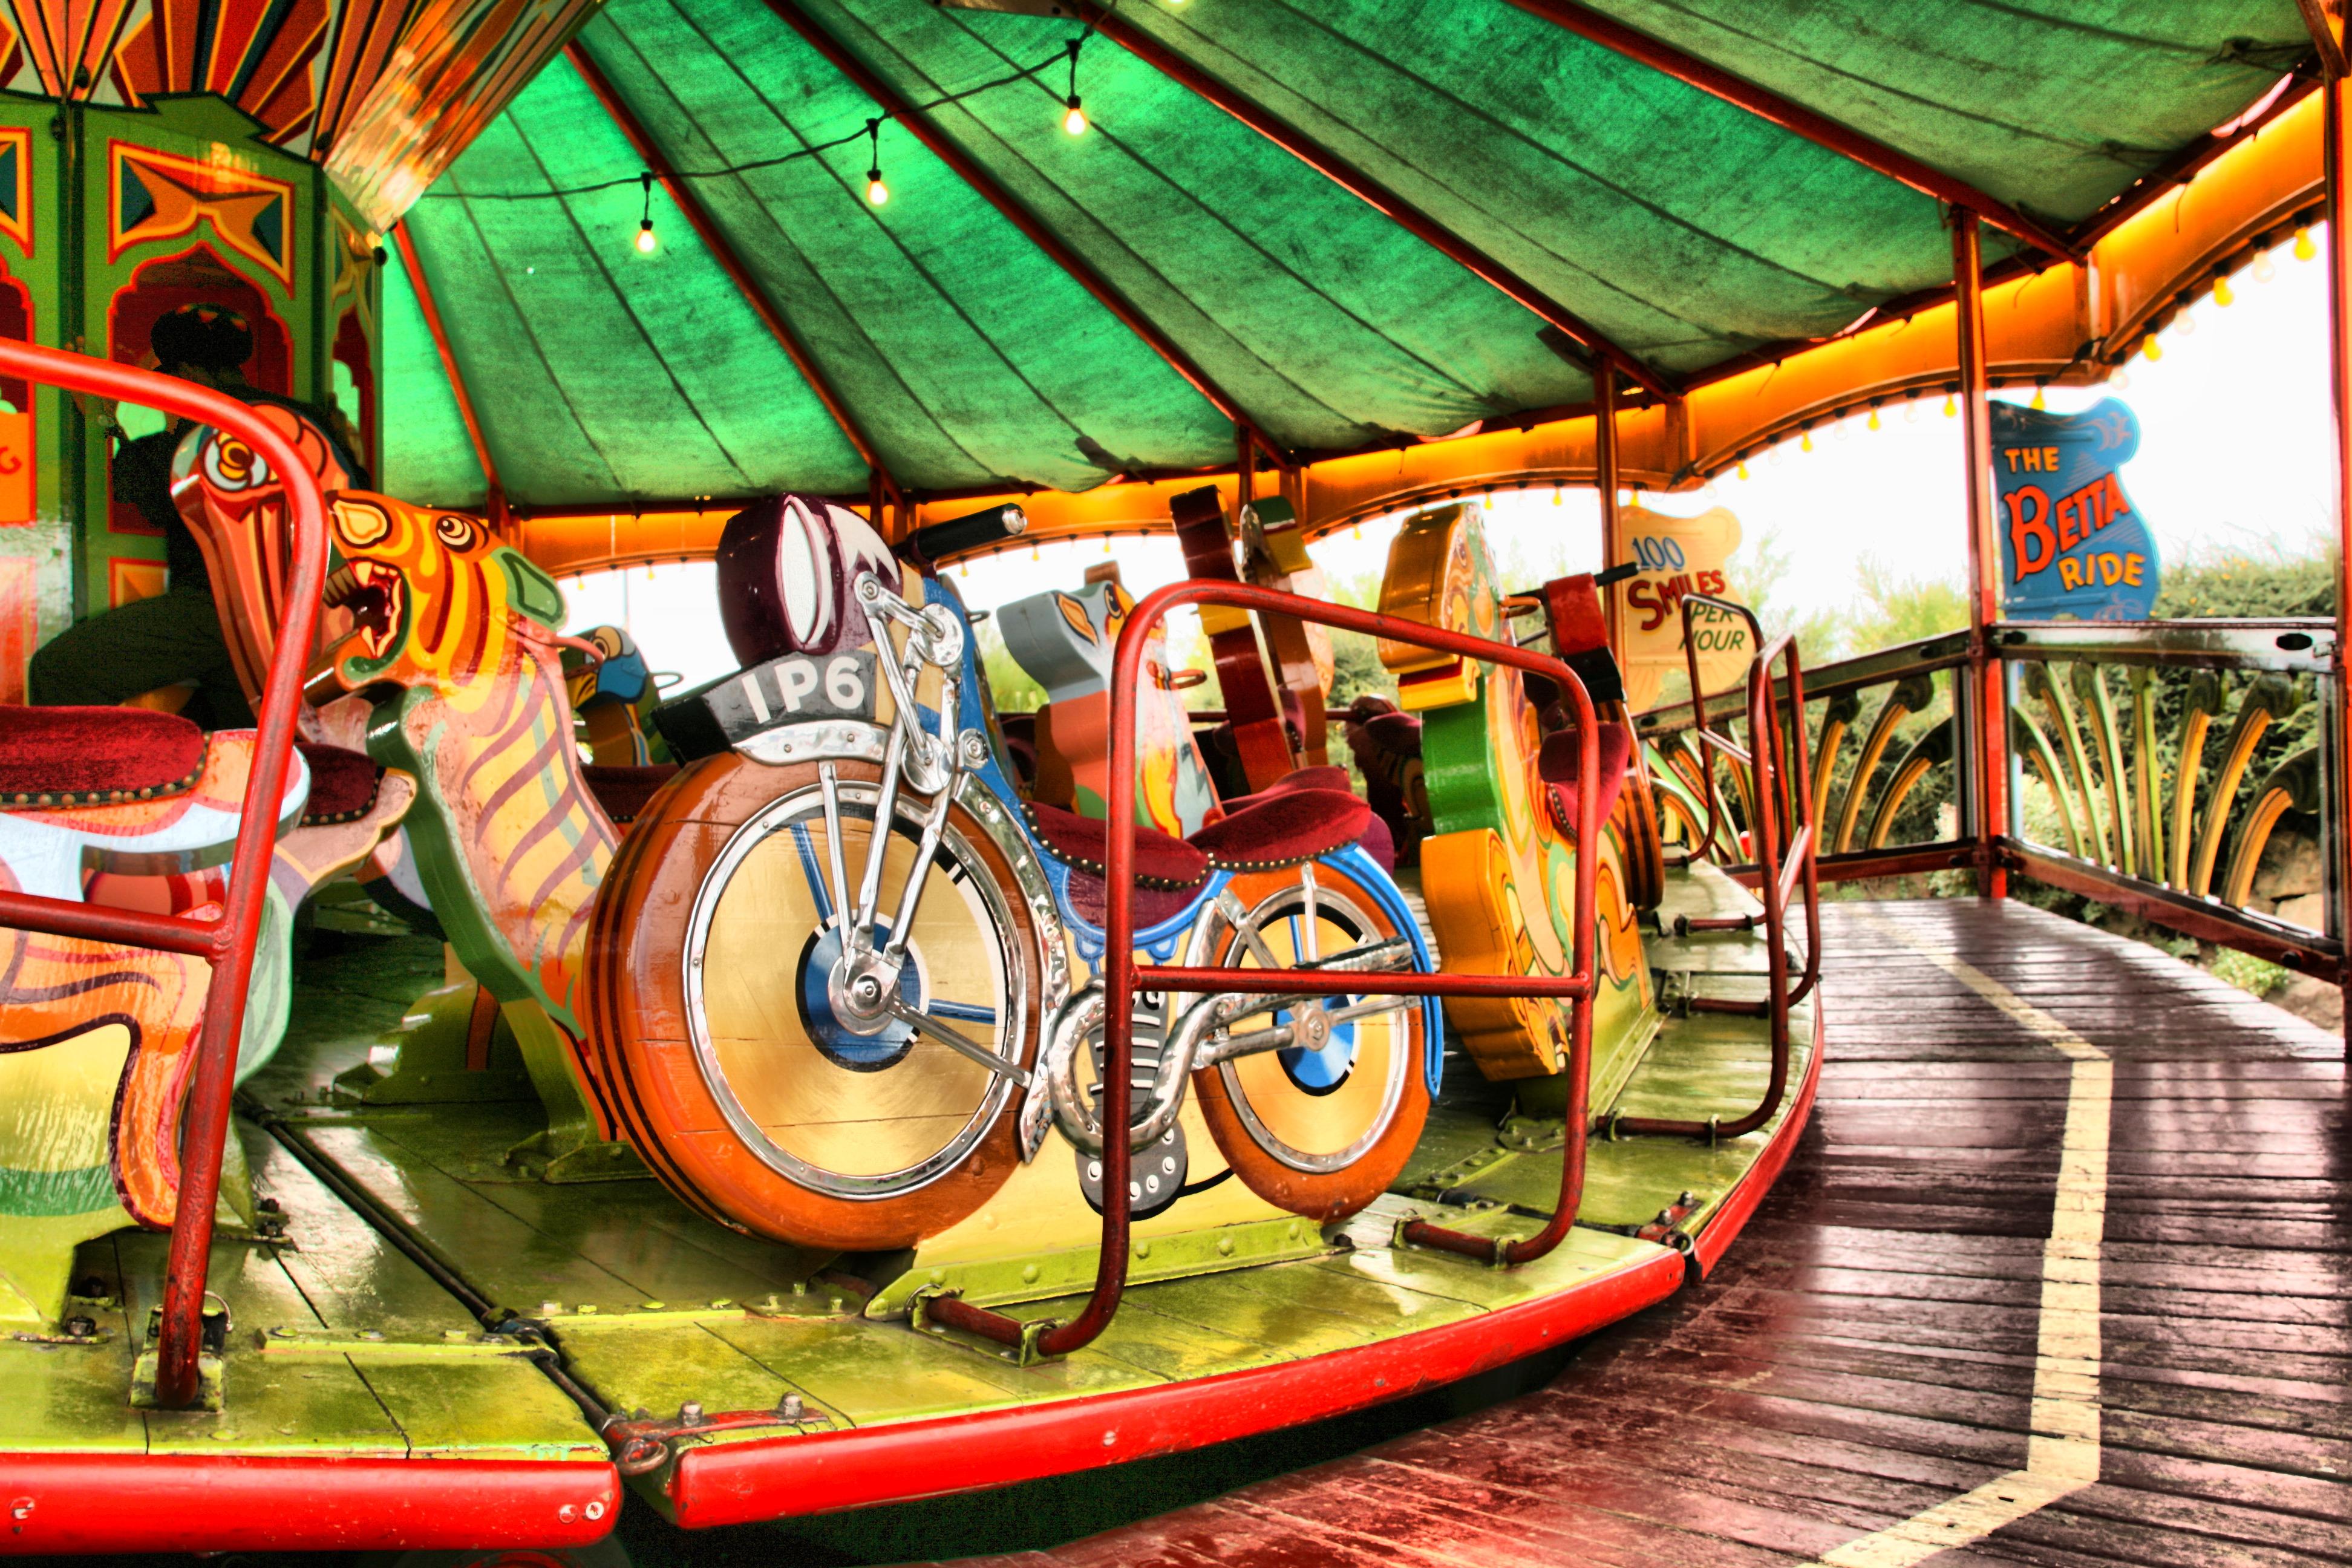 File:Old style fairground ride, Weston-Super-Mare (2792266252).jpg ...